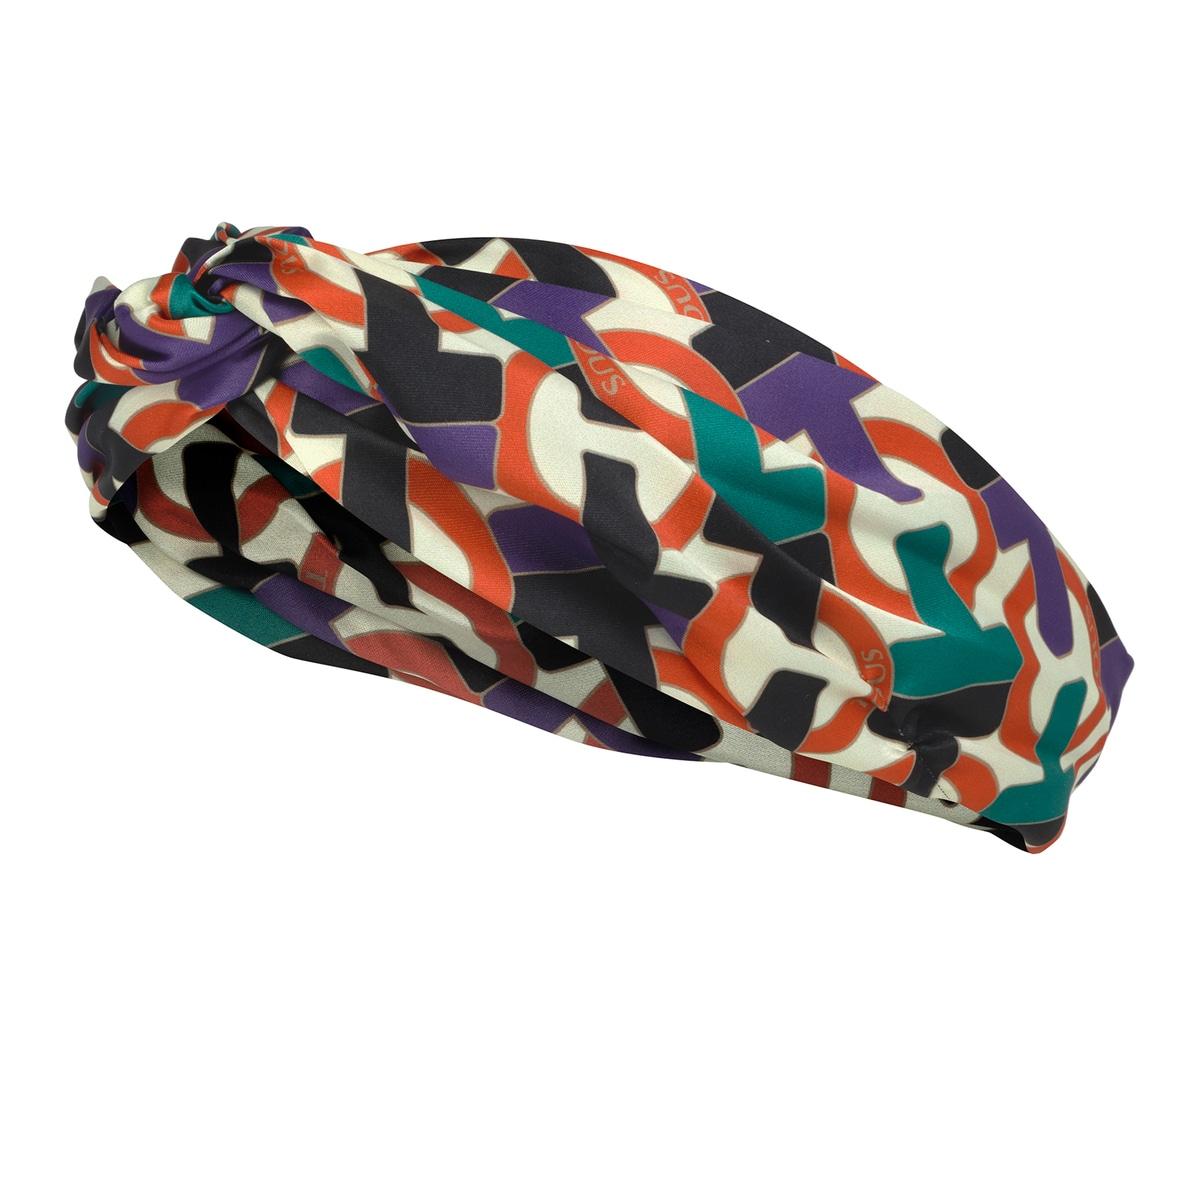 Lilac elastic T Hold Headband